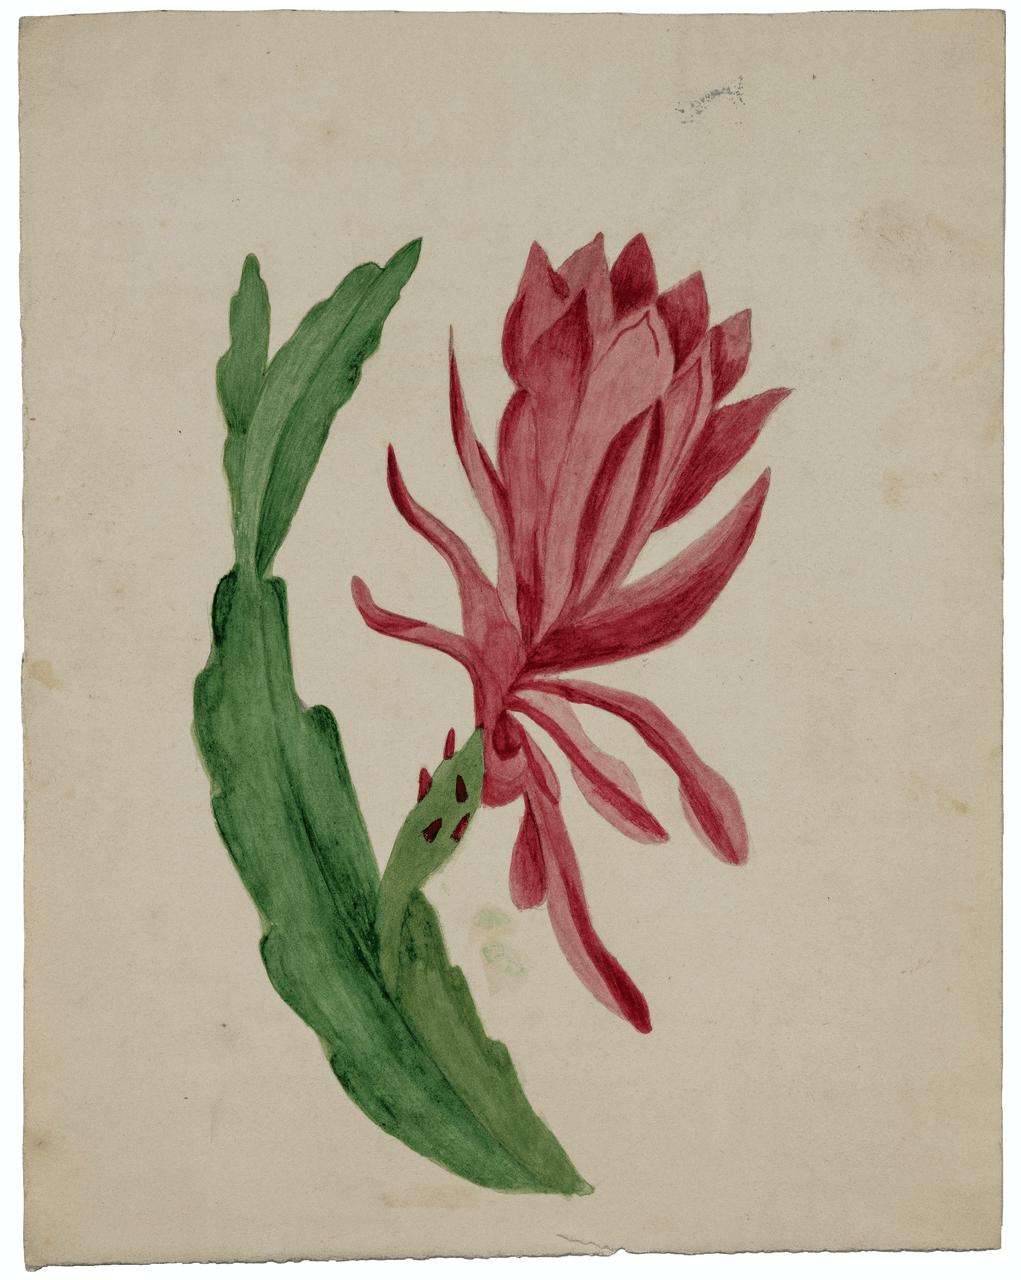 An Antique Botanical Watercolor Study